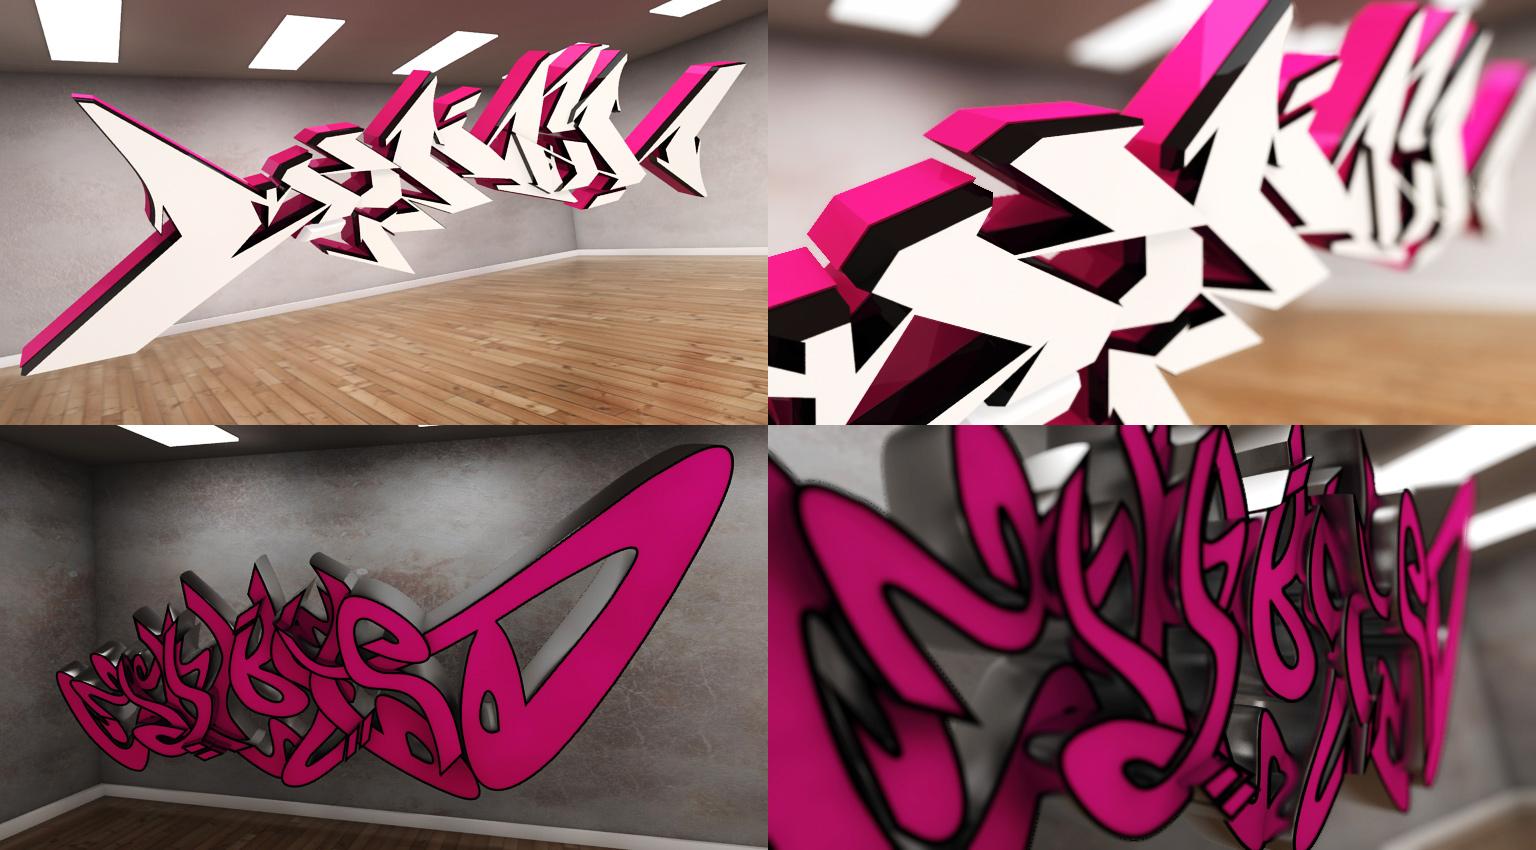 Graffos by FoT